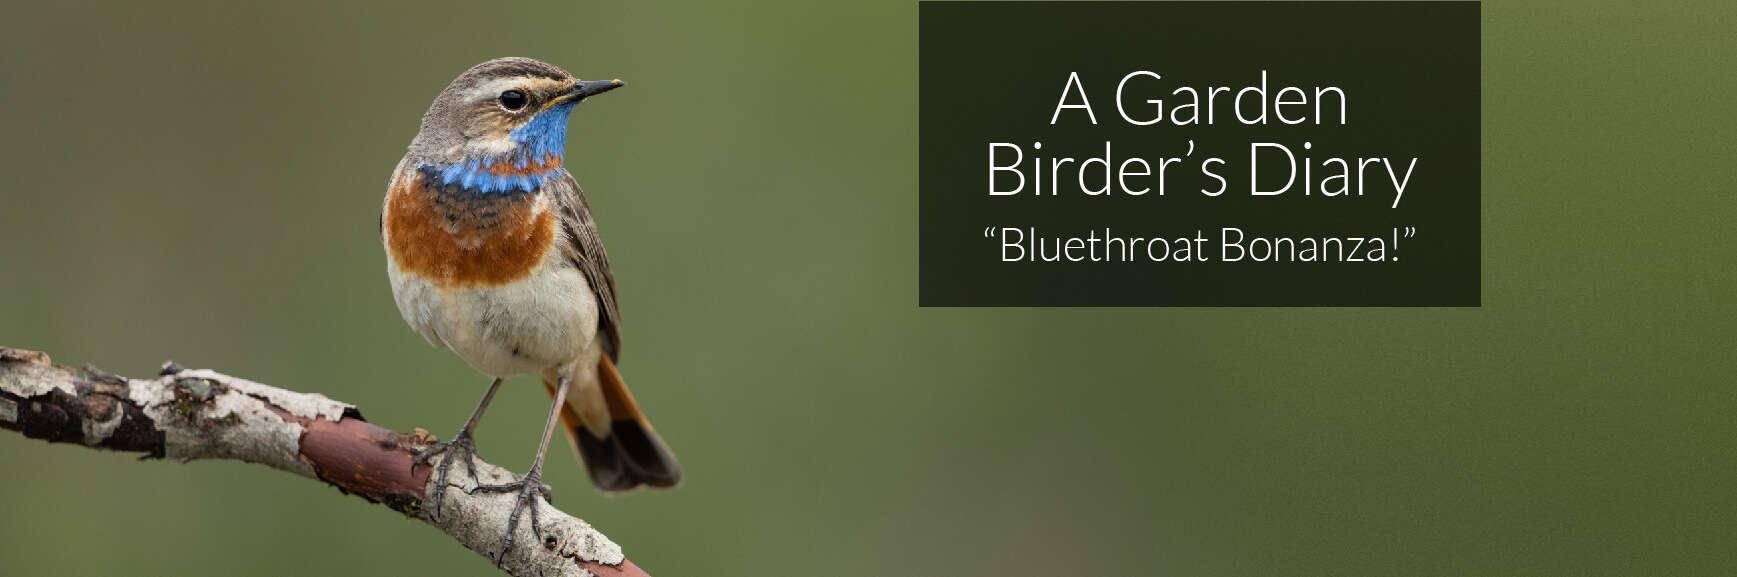 A Garden Birder's Diary – Bluethroat Bonanza